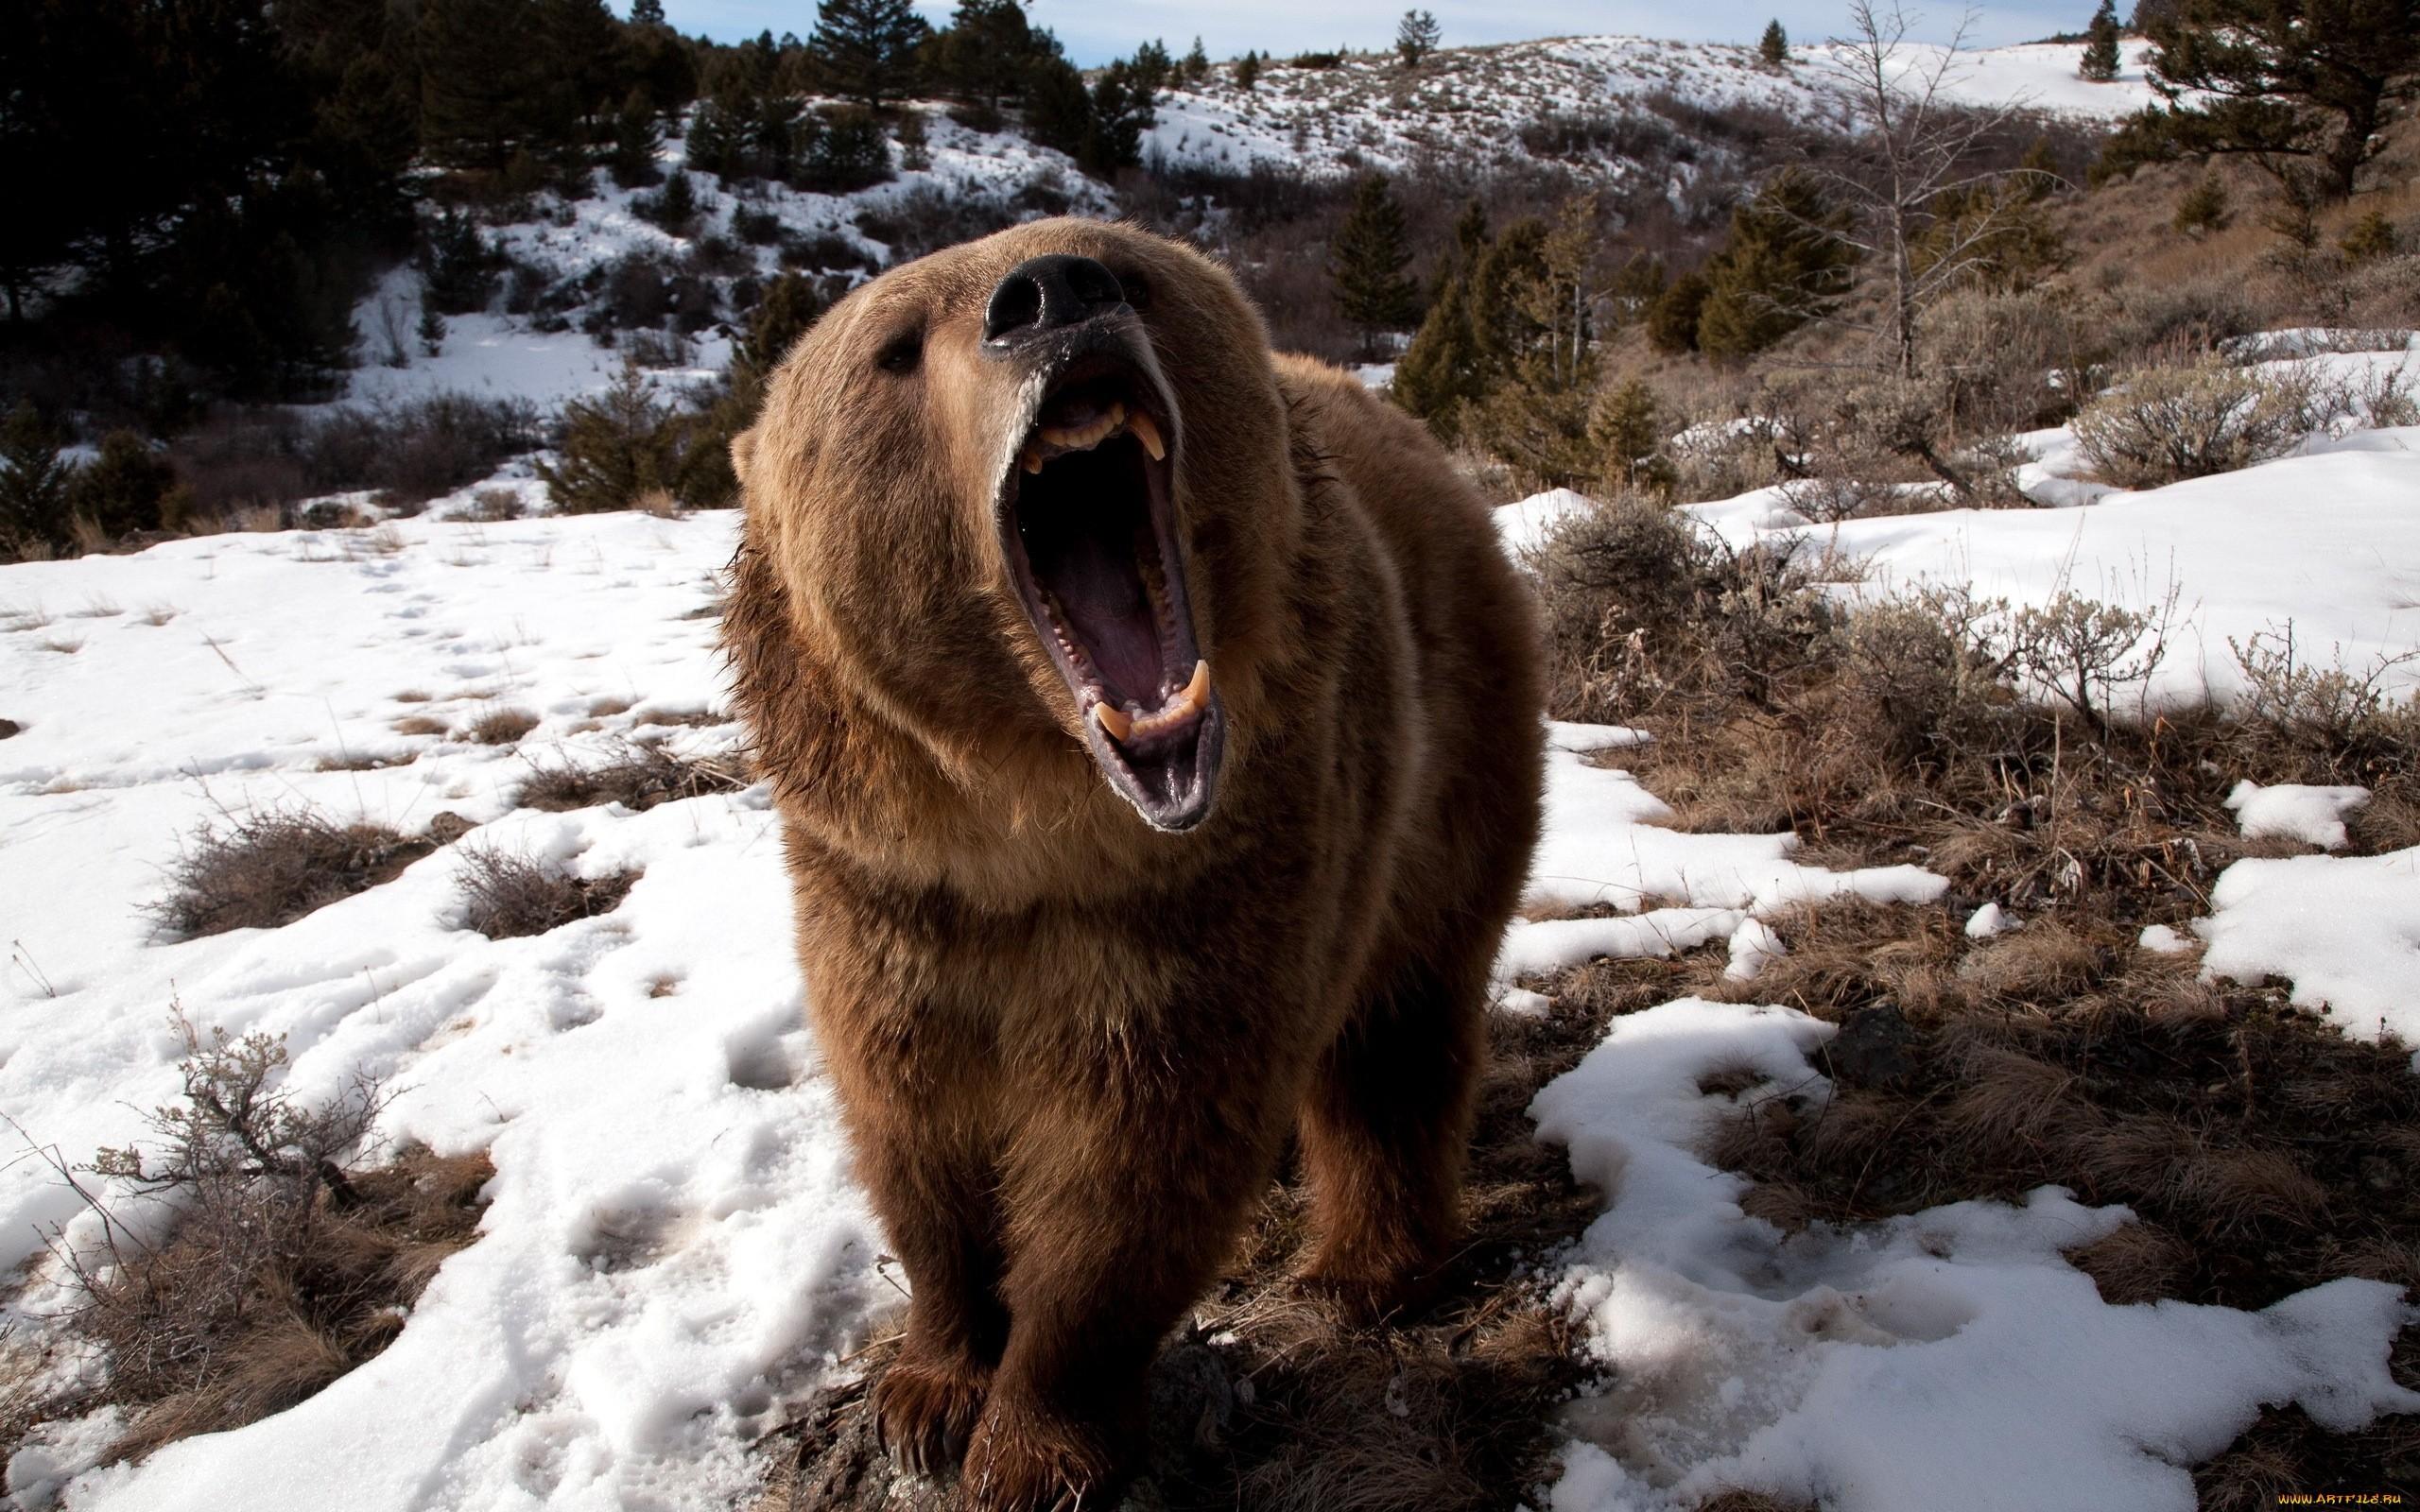 wallpaper animals snow winter lion wildlife bears. Black Bedroom Furniture Sets. Home Design Ideas